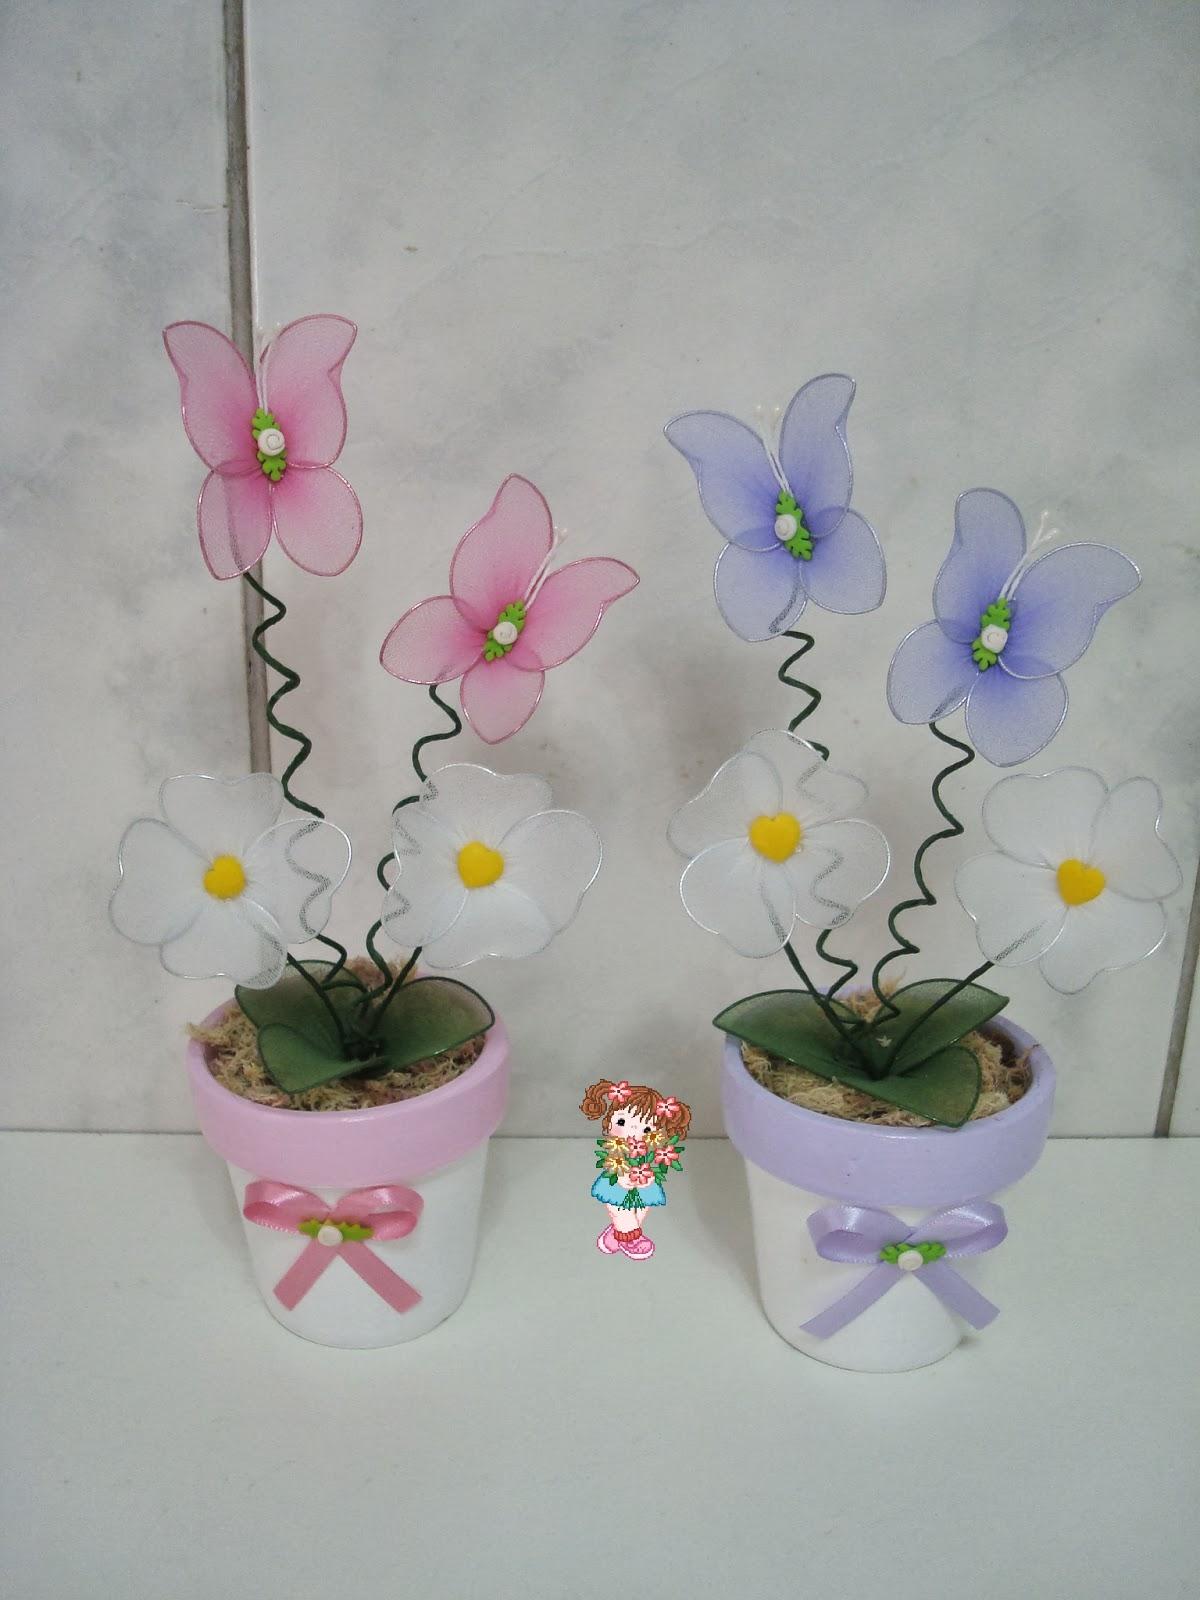 decoracao infantil jardim das borboletas:Enfeite de mesa Jardim das borboletas 2